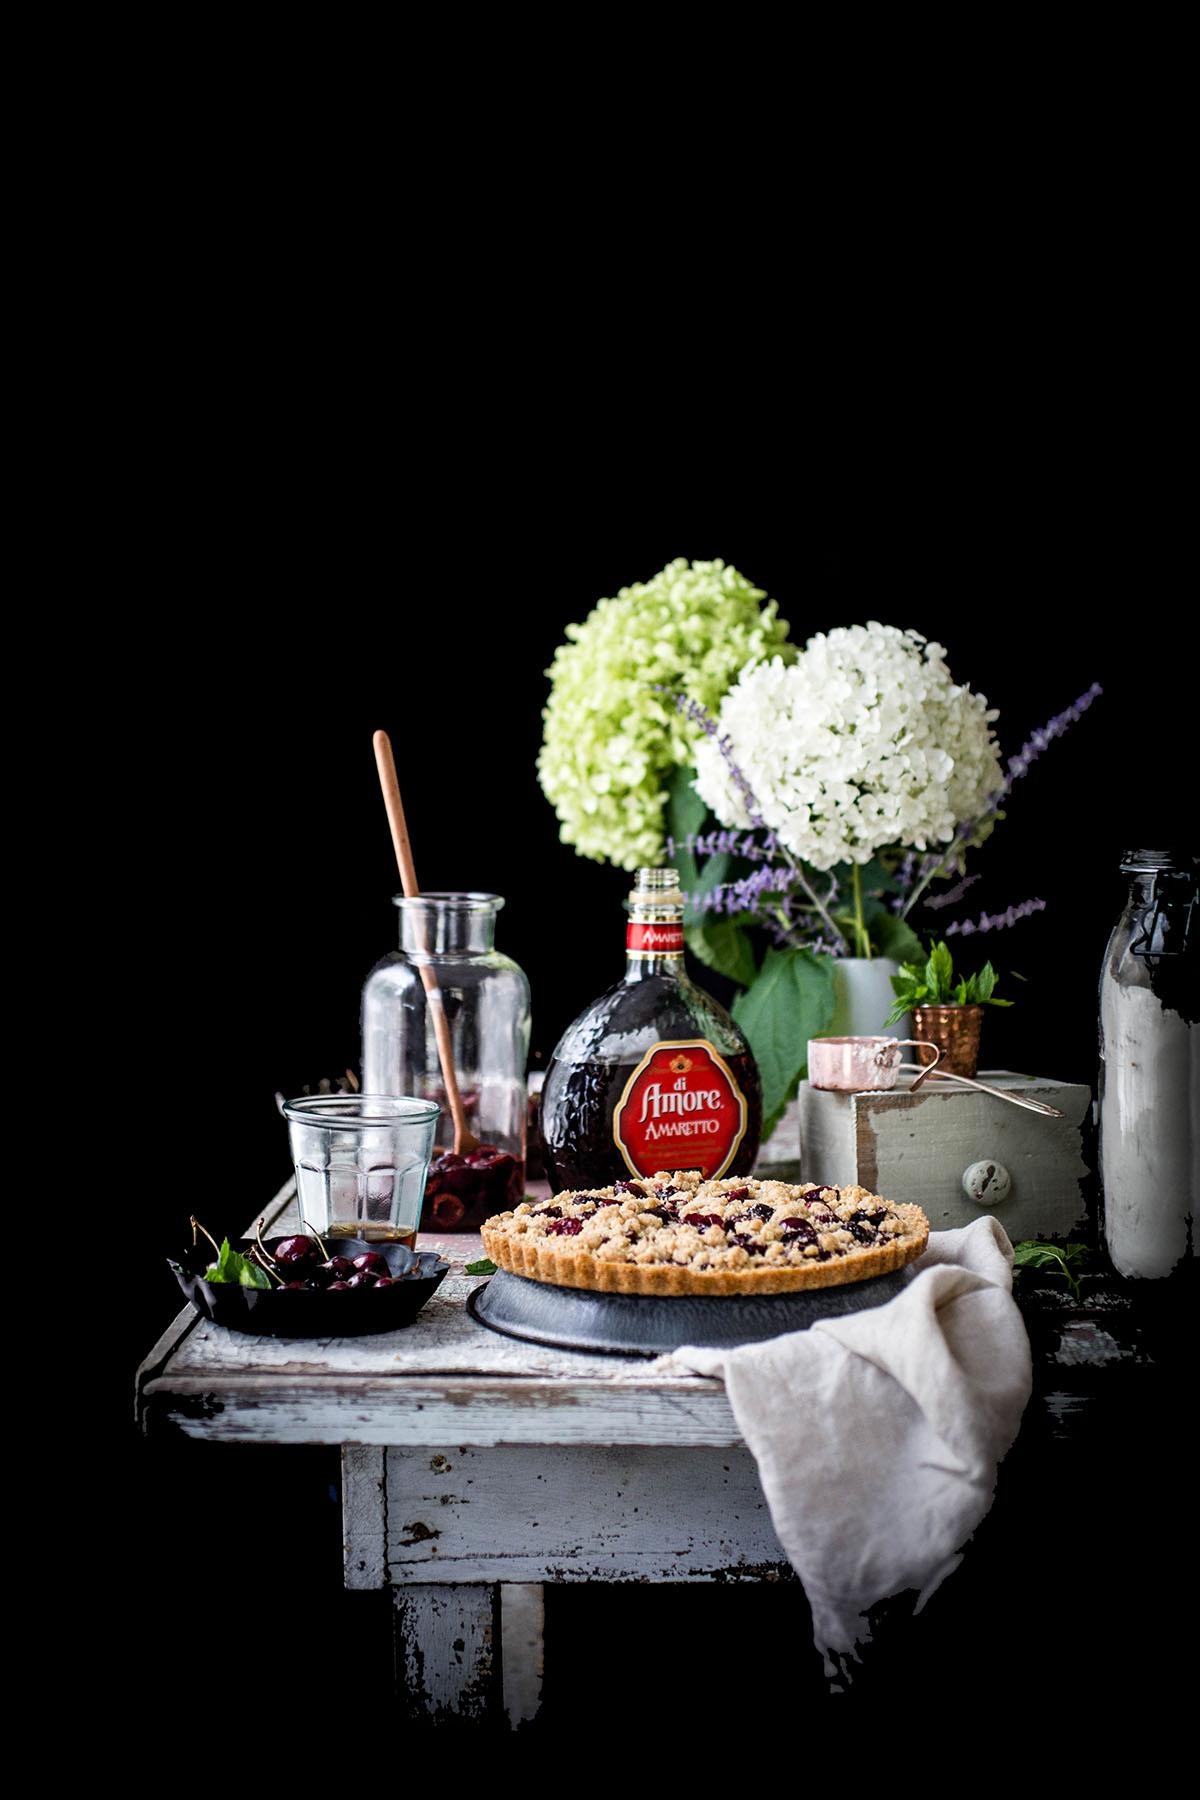 Cherry Shortbread Cookie Slices